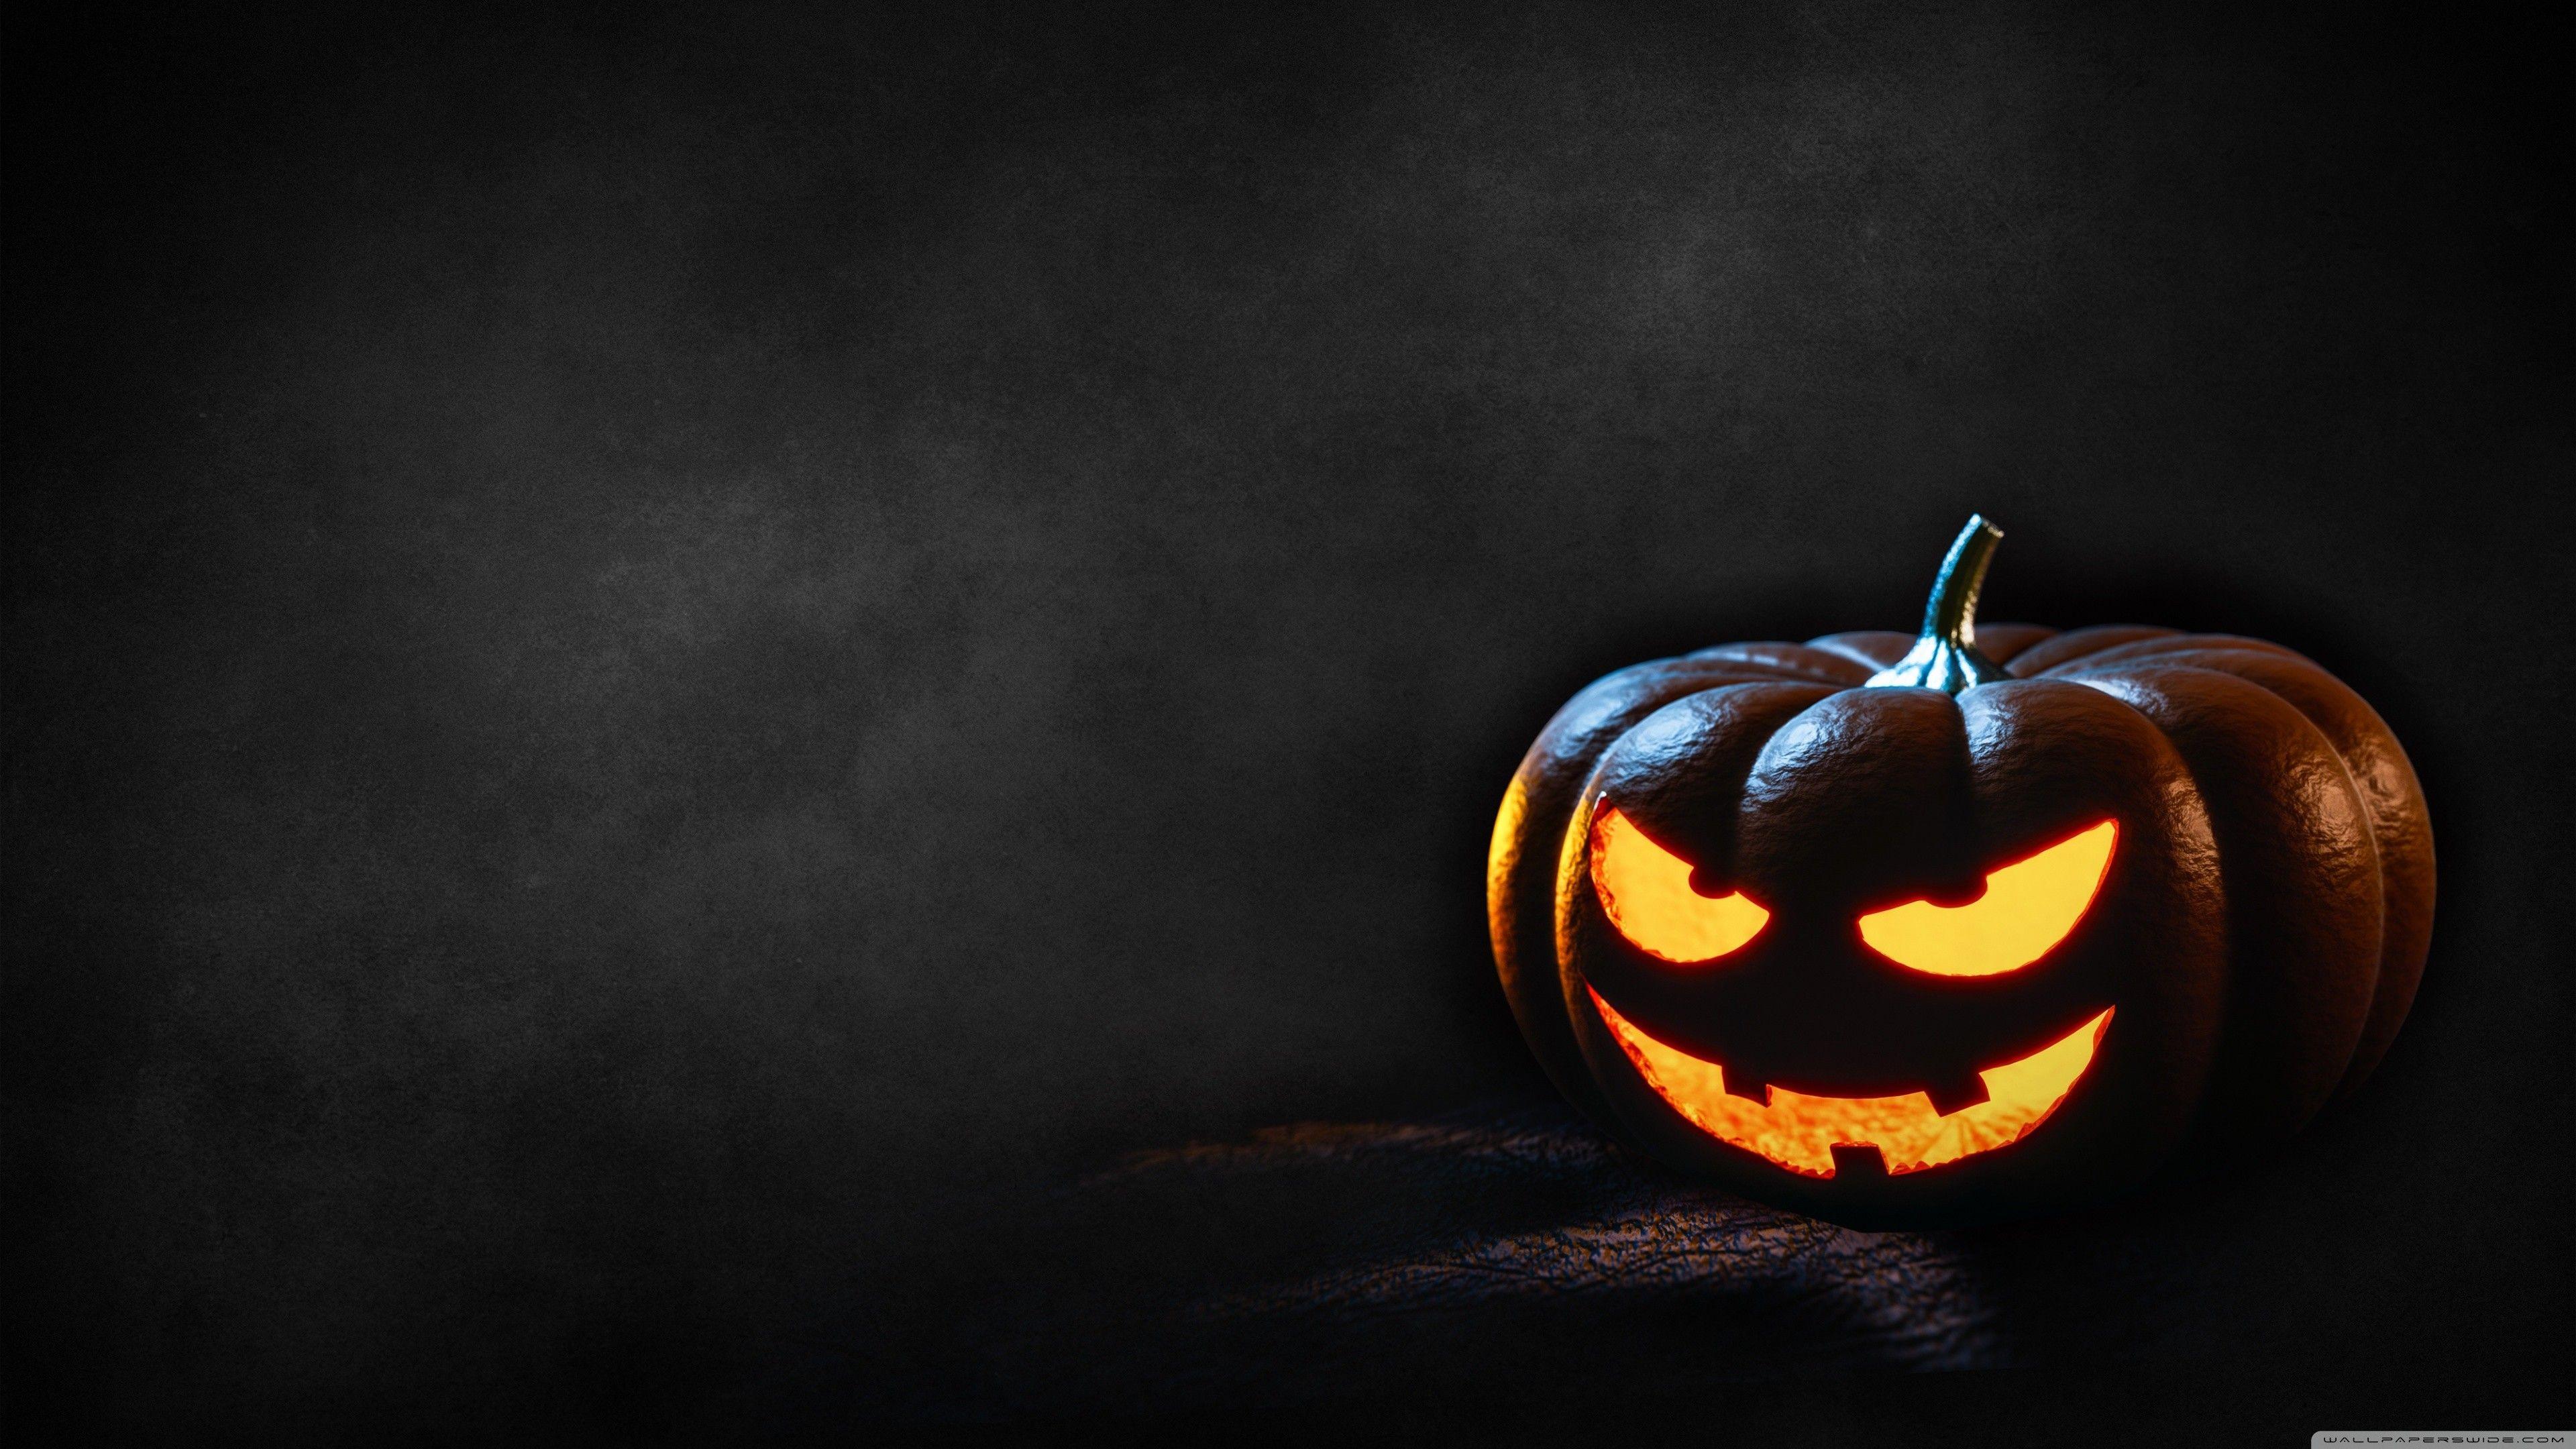 Res 3840x2160 Happy Halloween 2016 Hd Wide Wallpaper For 4k Uhd Widescreen Desktop Smartpho Scary Wallpaper Halloween Desktop Wallpaper Halloween Pictures